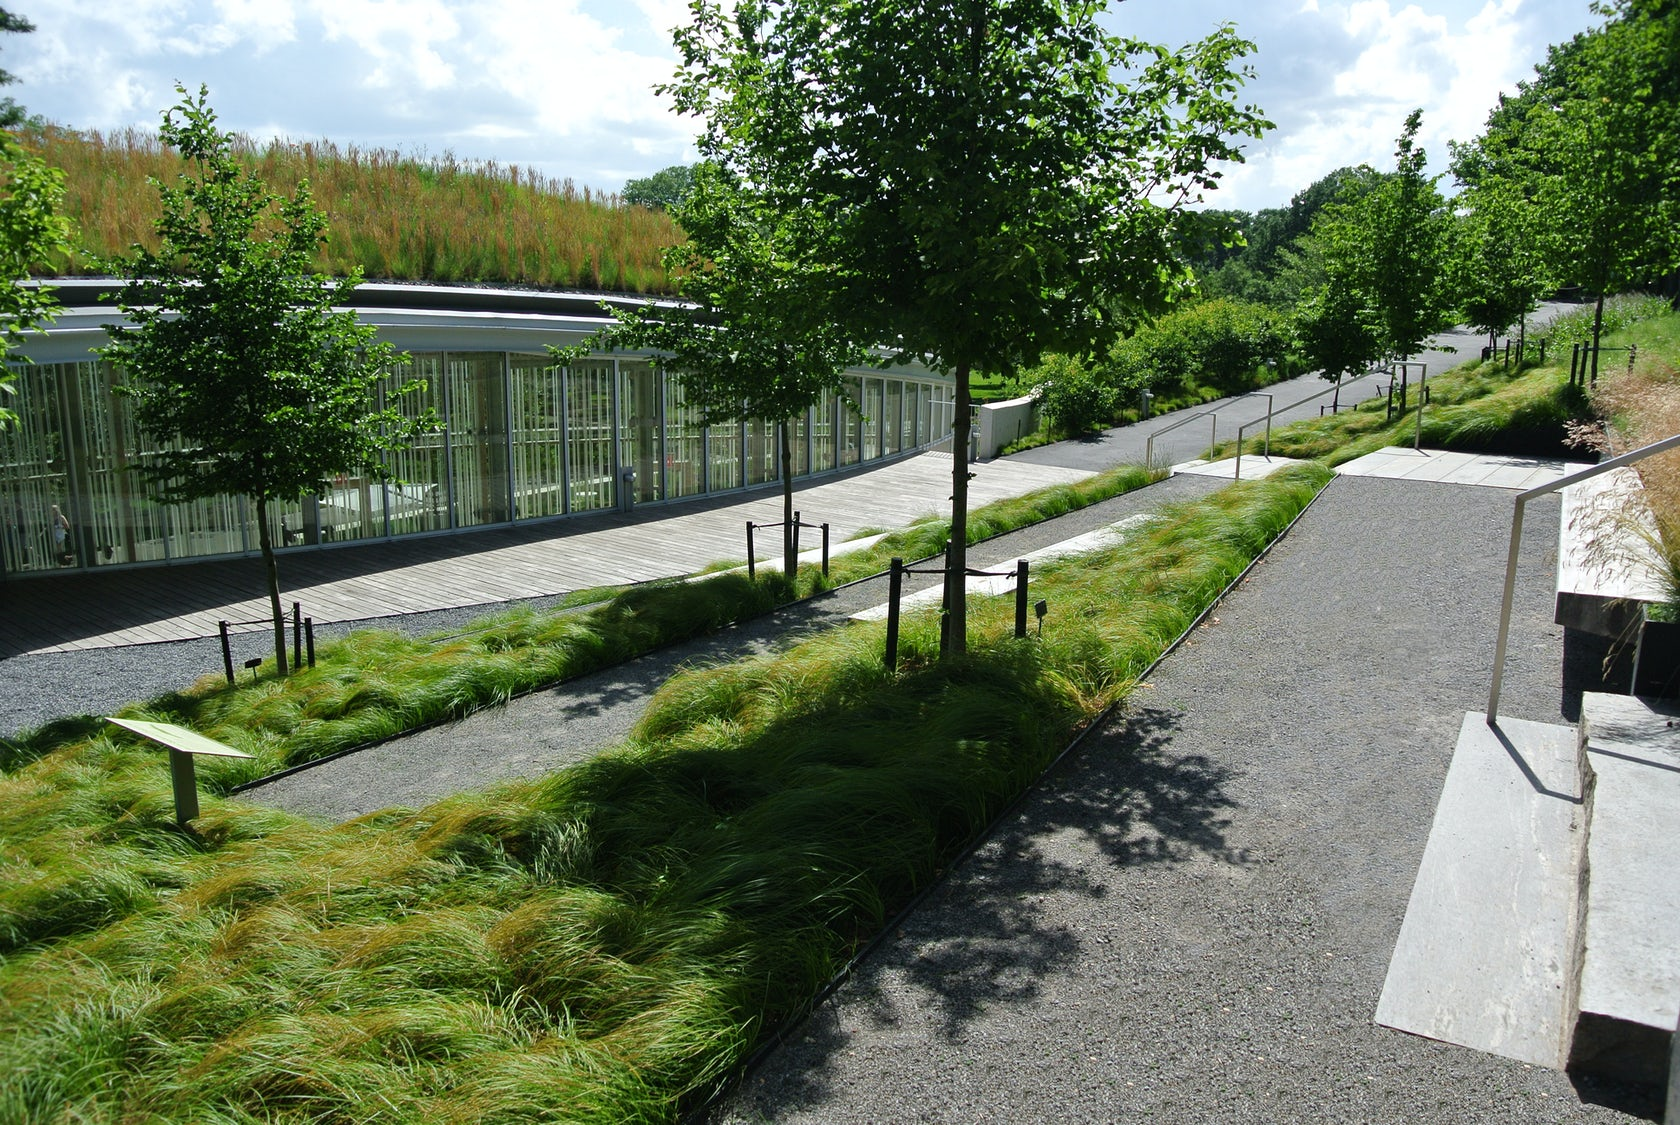 Brooklyn botanic garden visitor center living roof and landscape architizer for Brooklyn botanical garden parking